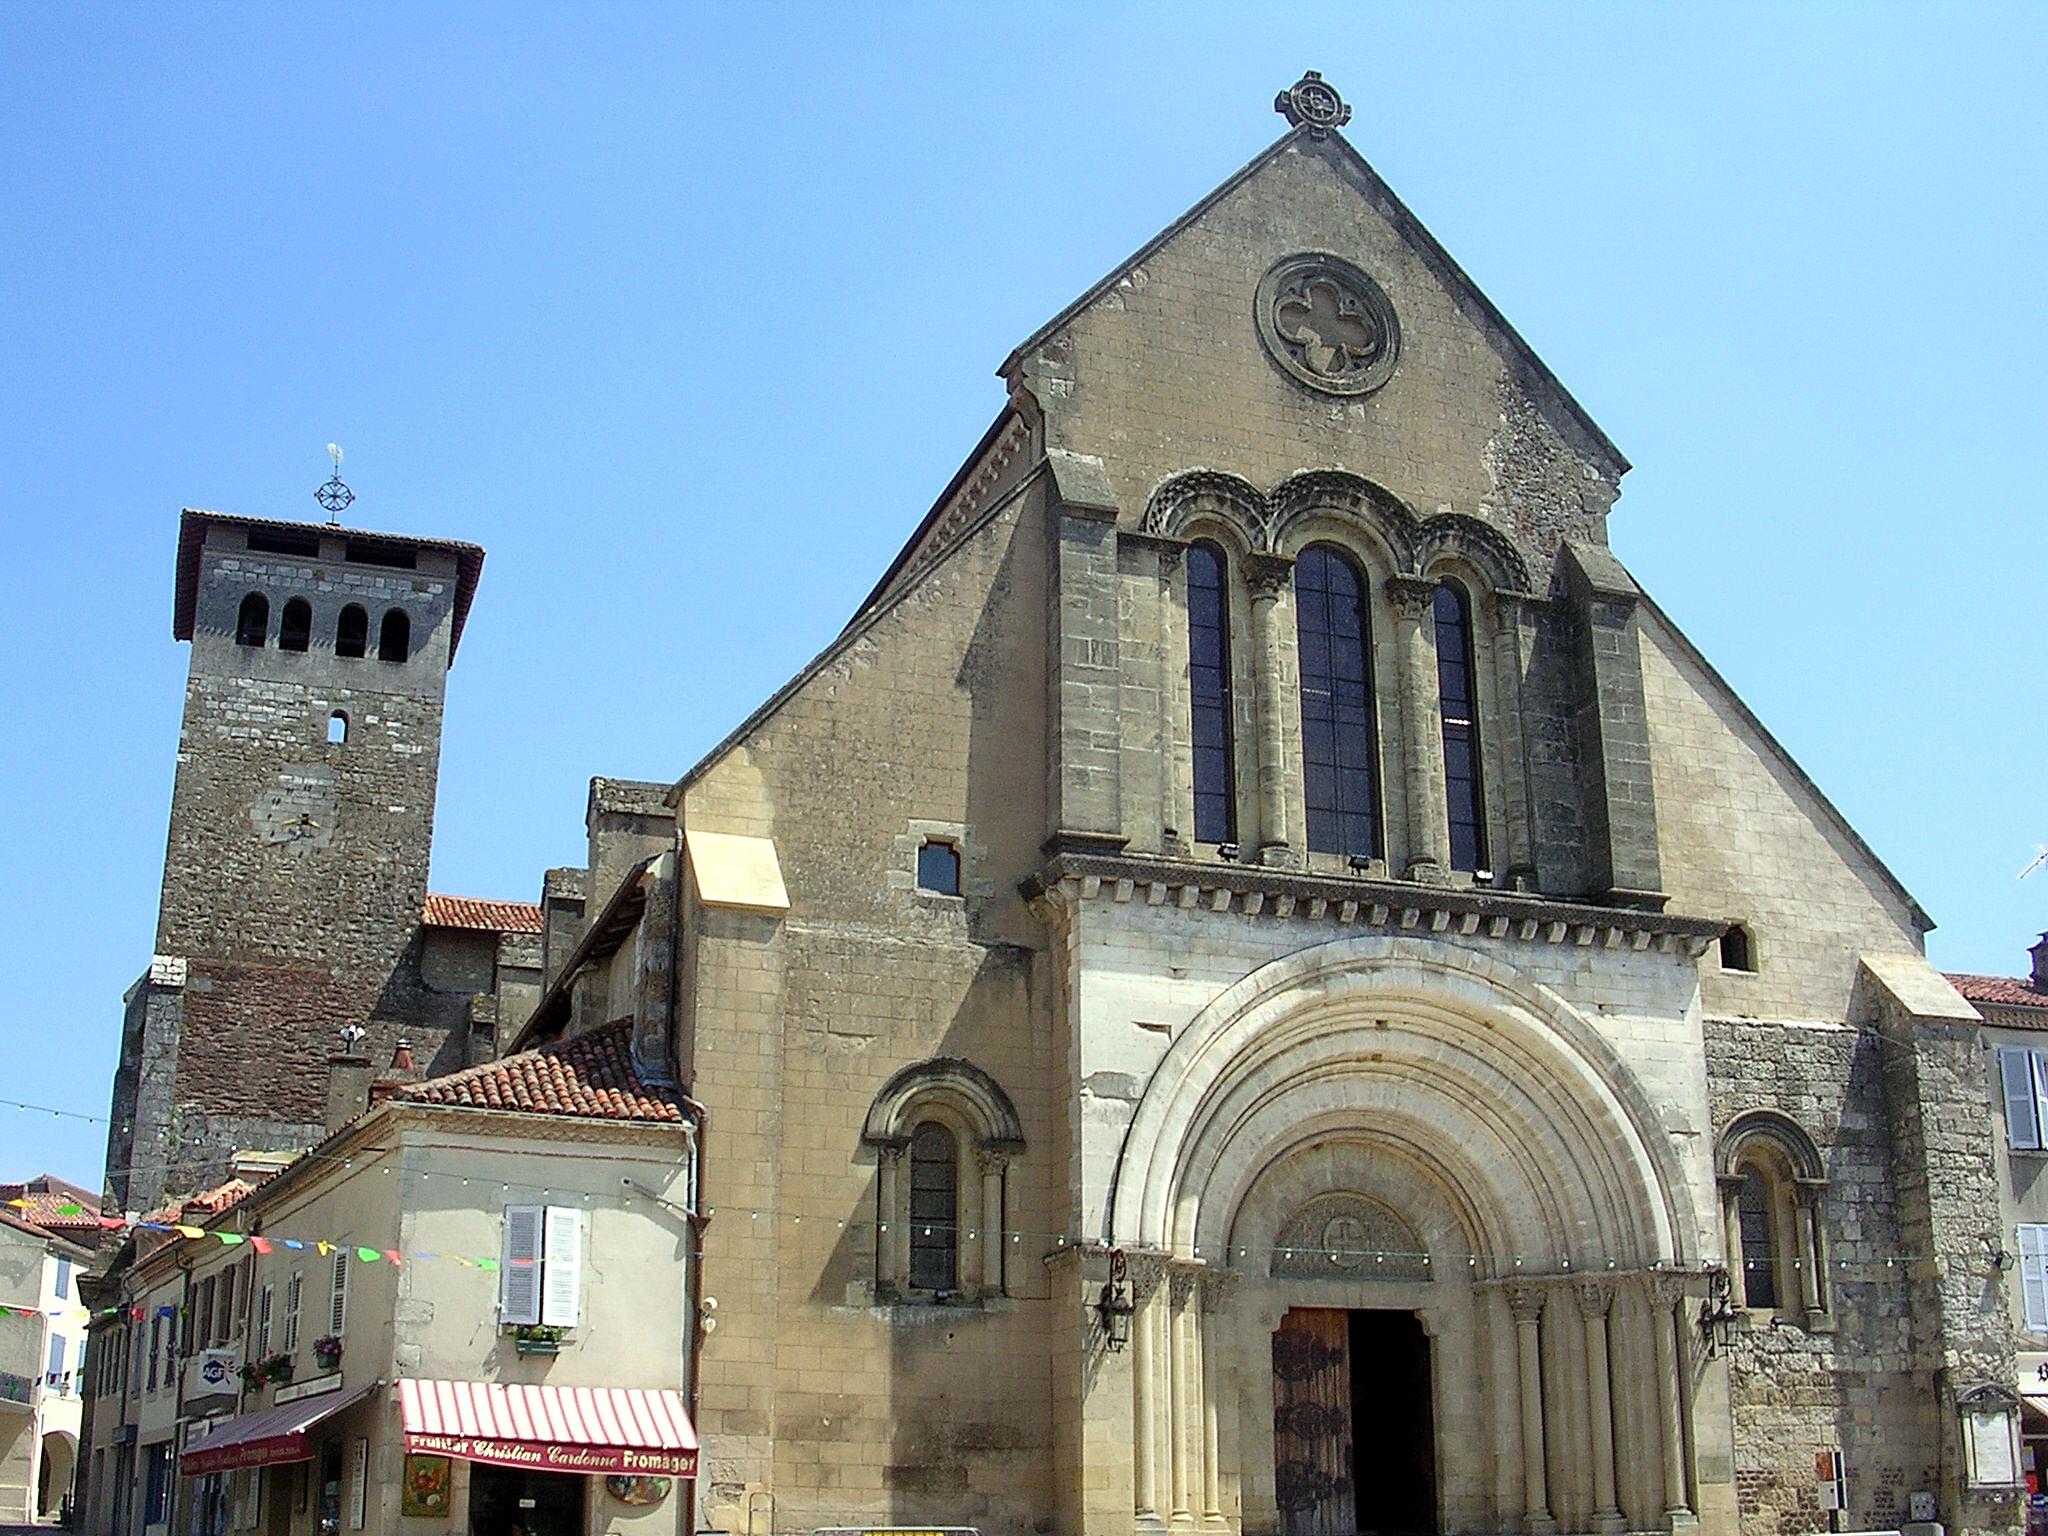 http://upload.wikimedia.org/wikipedia/commons/f/f8/Abbaye_St_Sever_1.JPG